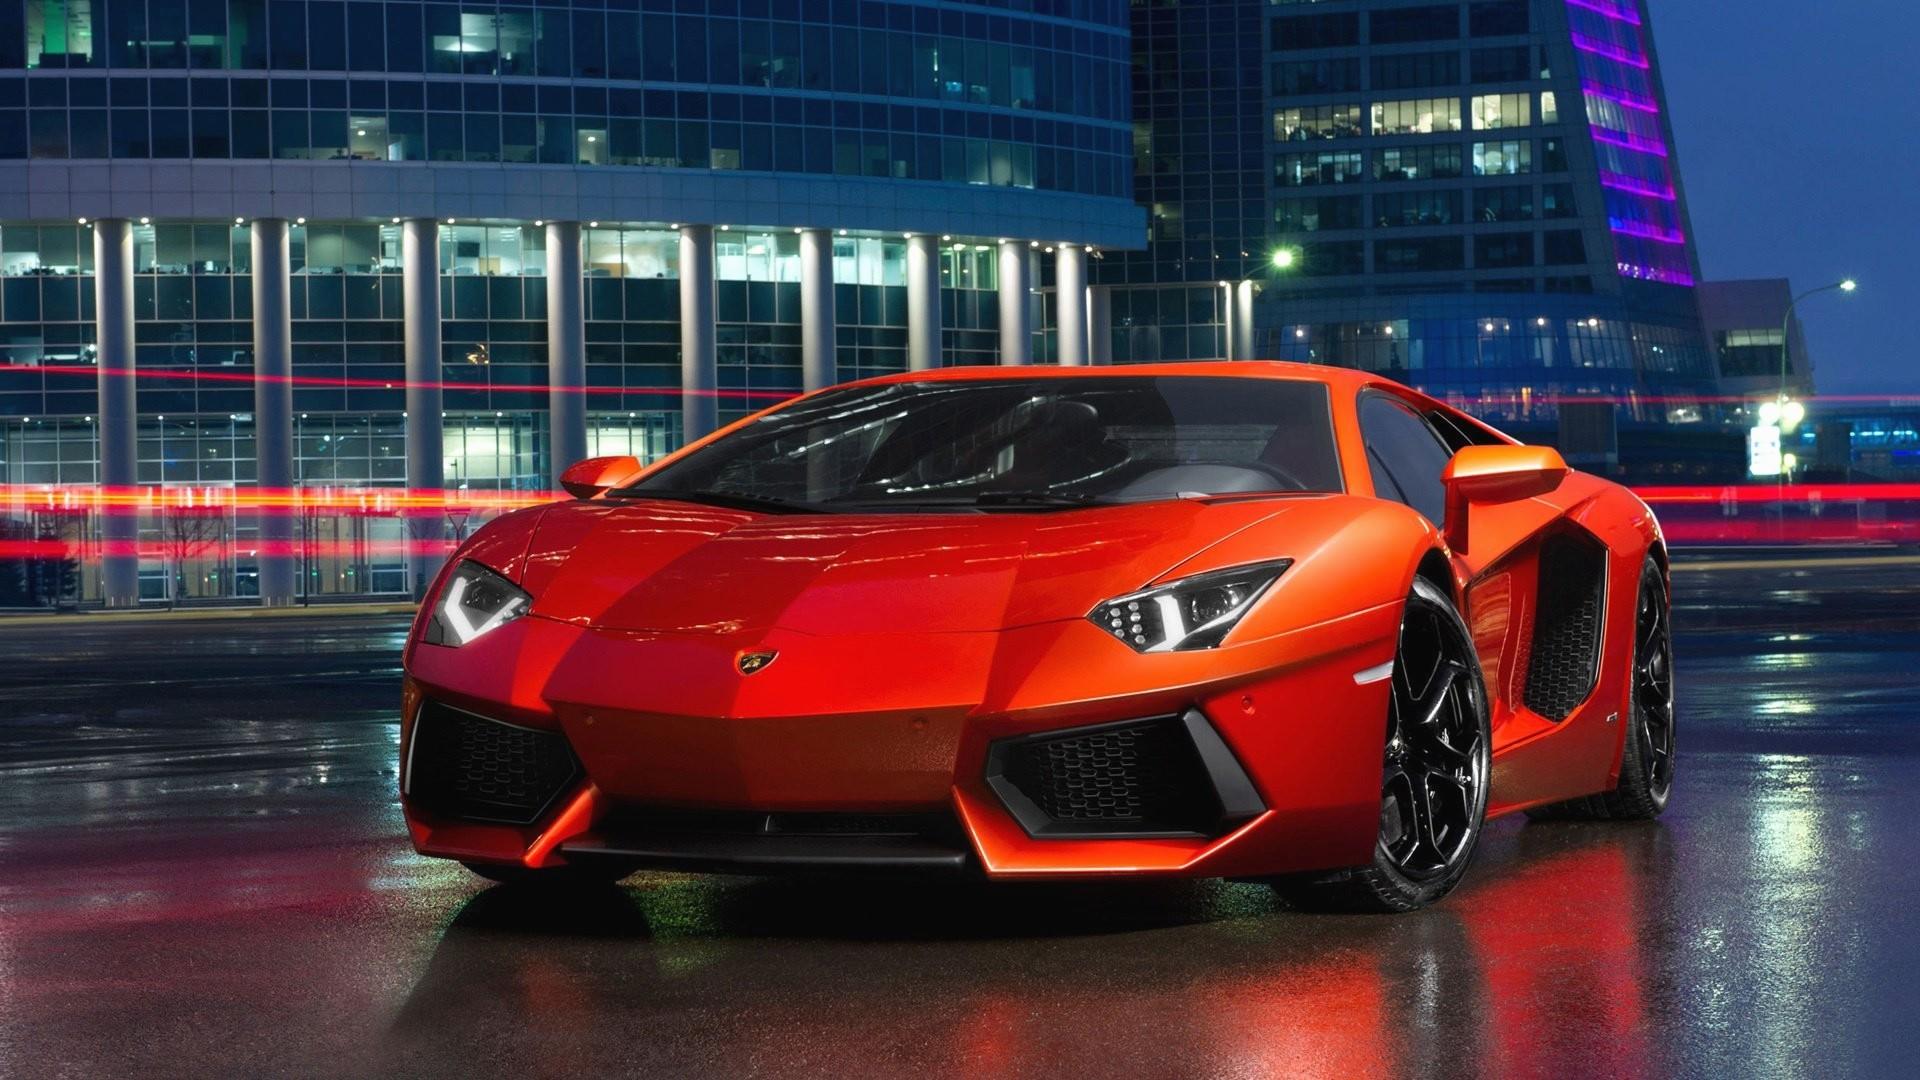 Lamborghini Cars Wallpapers HD Wallpaper Collections